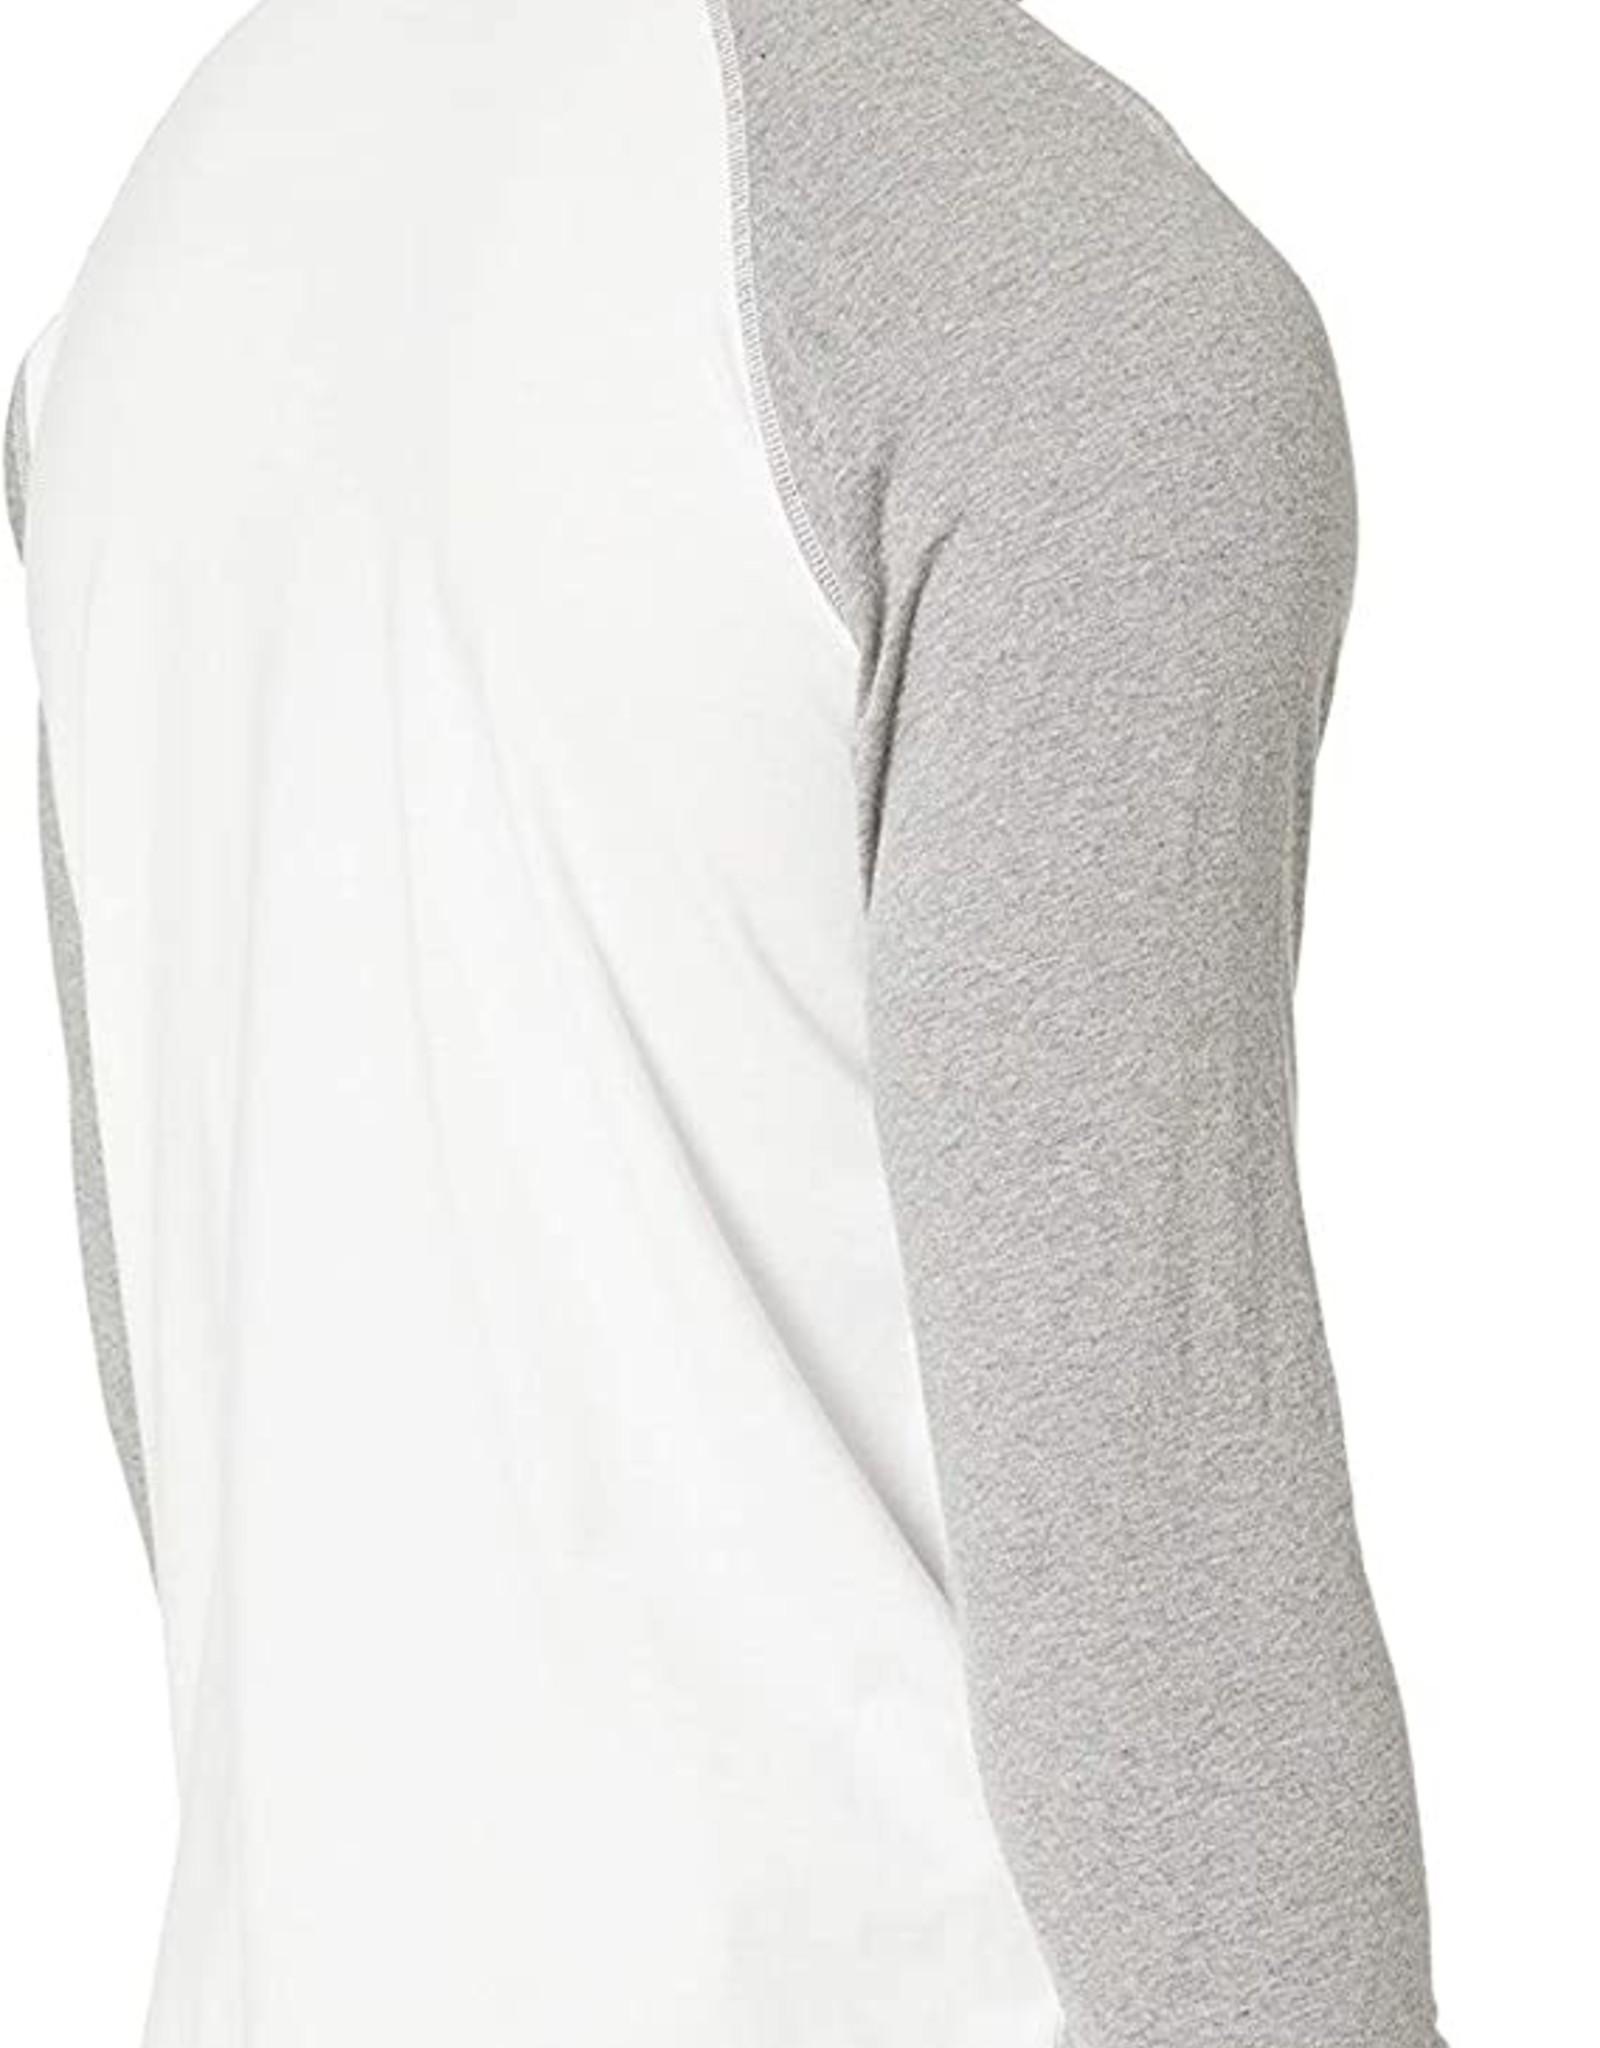 Ecoths Cashel hoodie